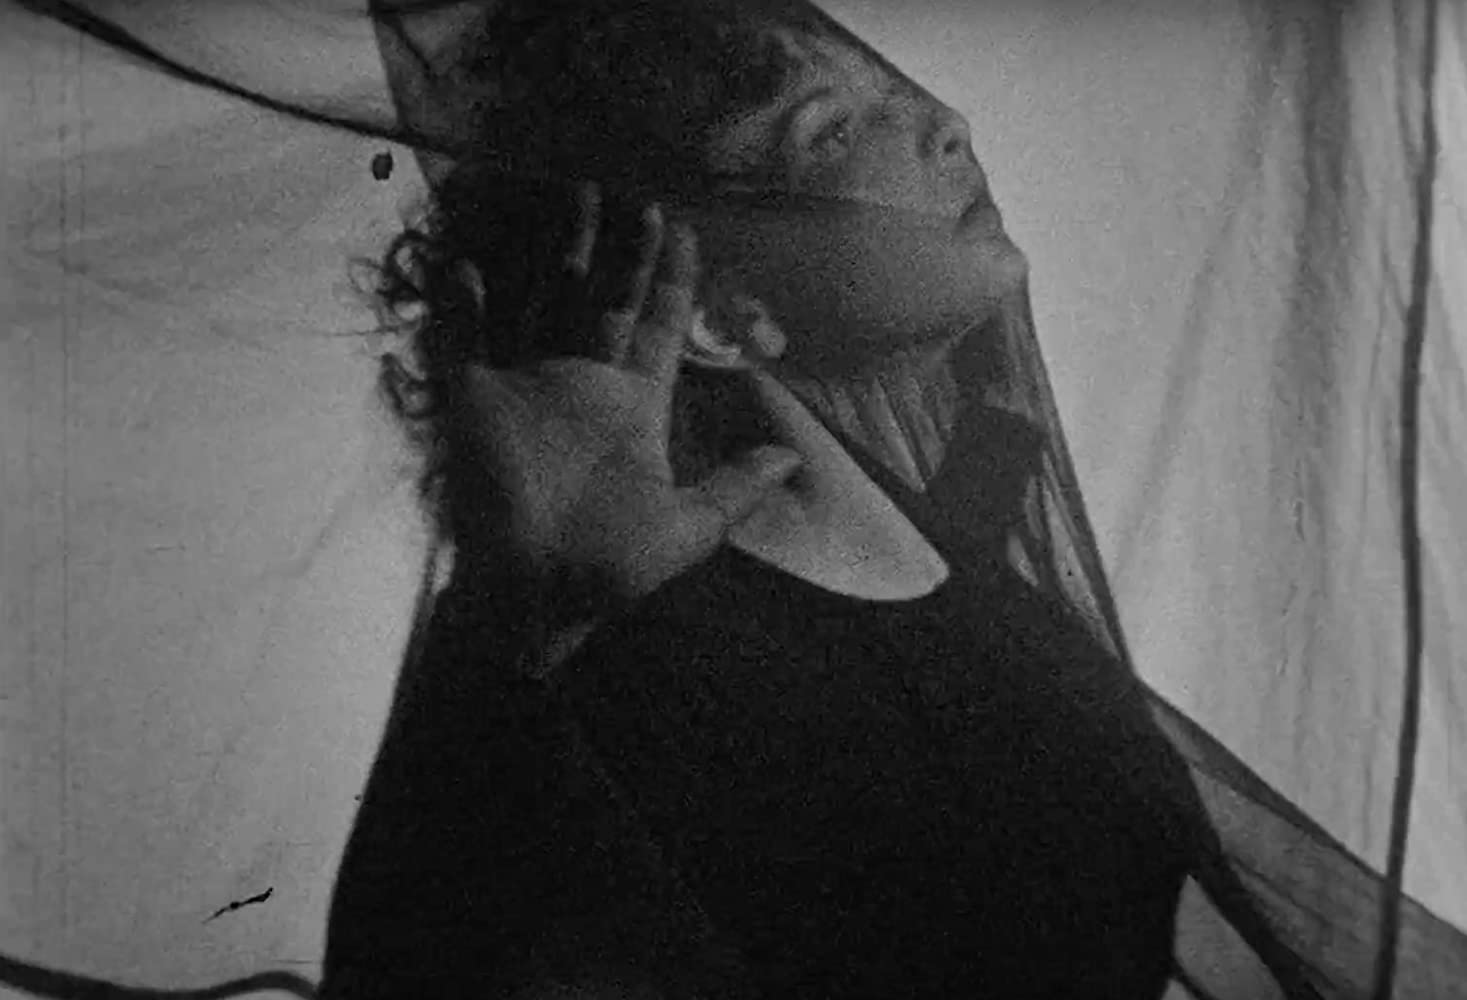 Bunny Gibson,Olivia Newton-John (born 1948) Erotic video Julie McCullough,Zuleyka Silver